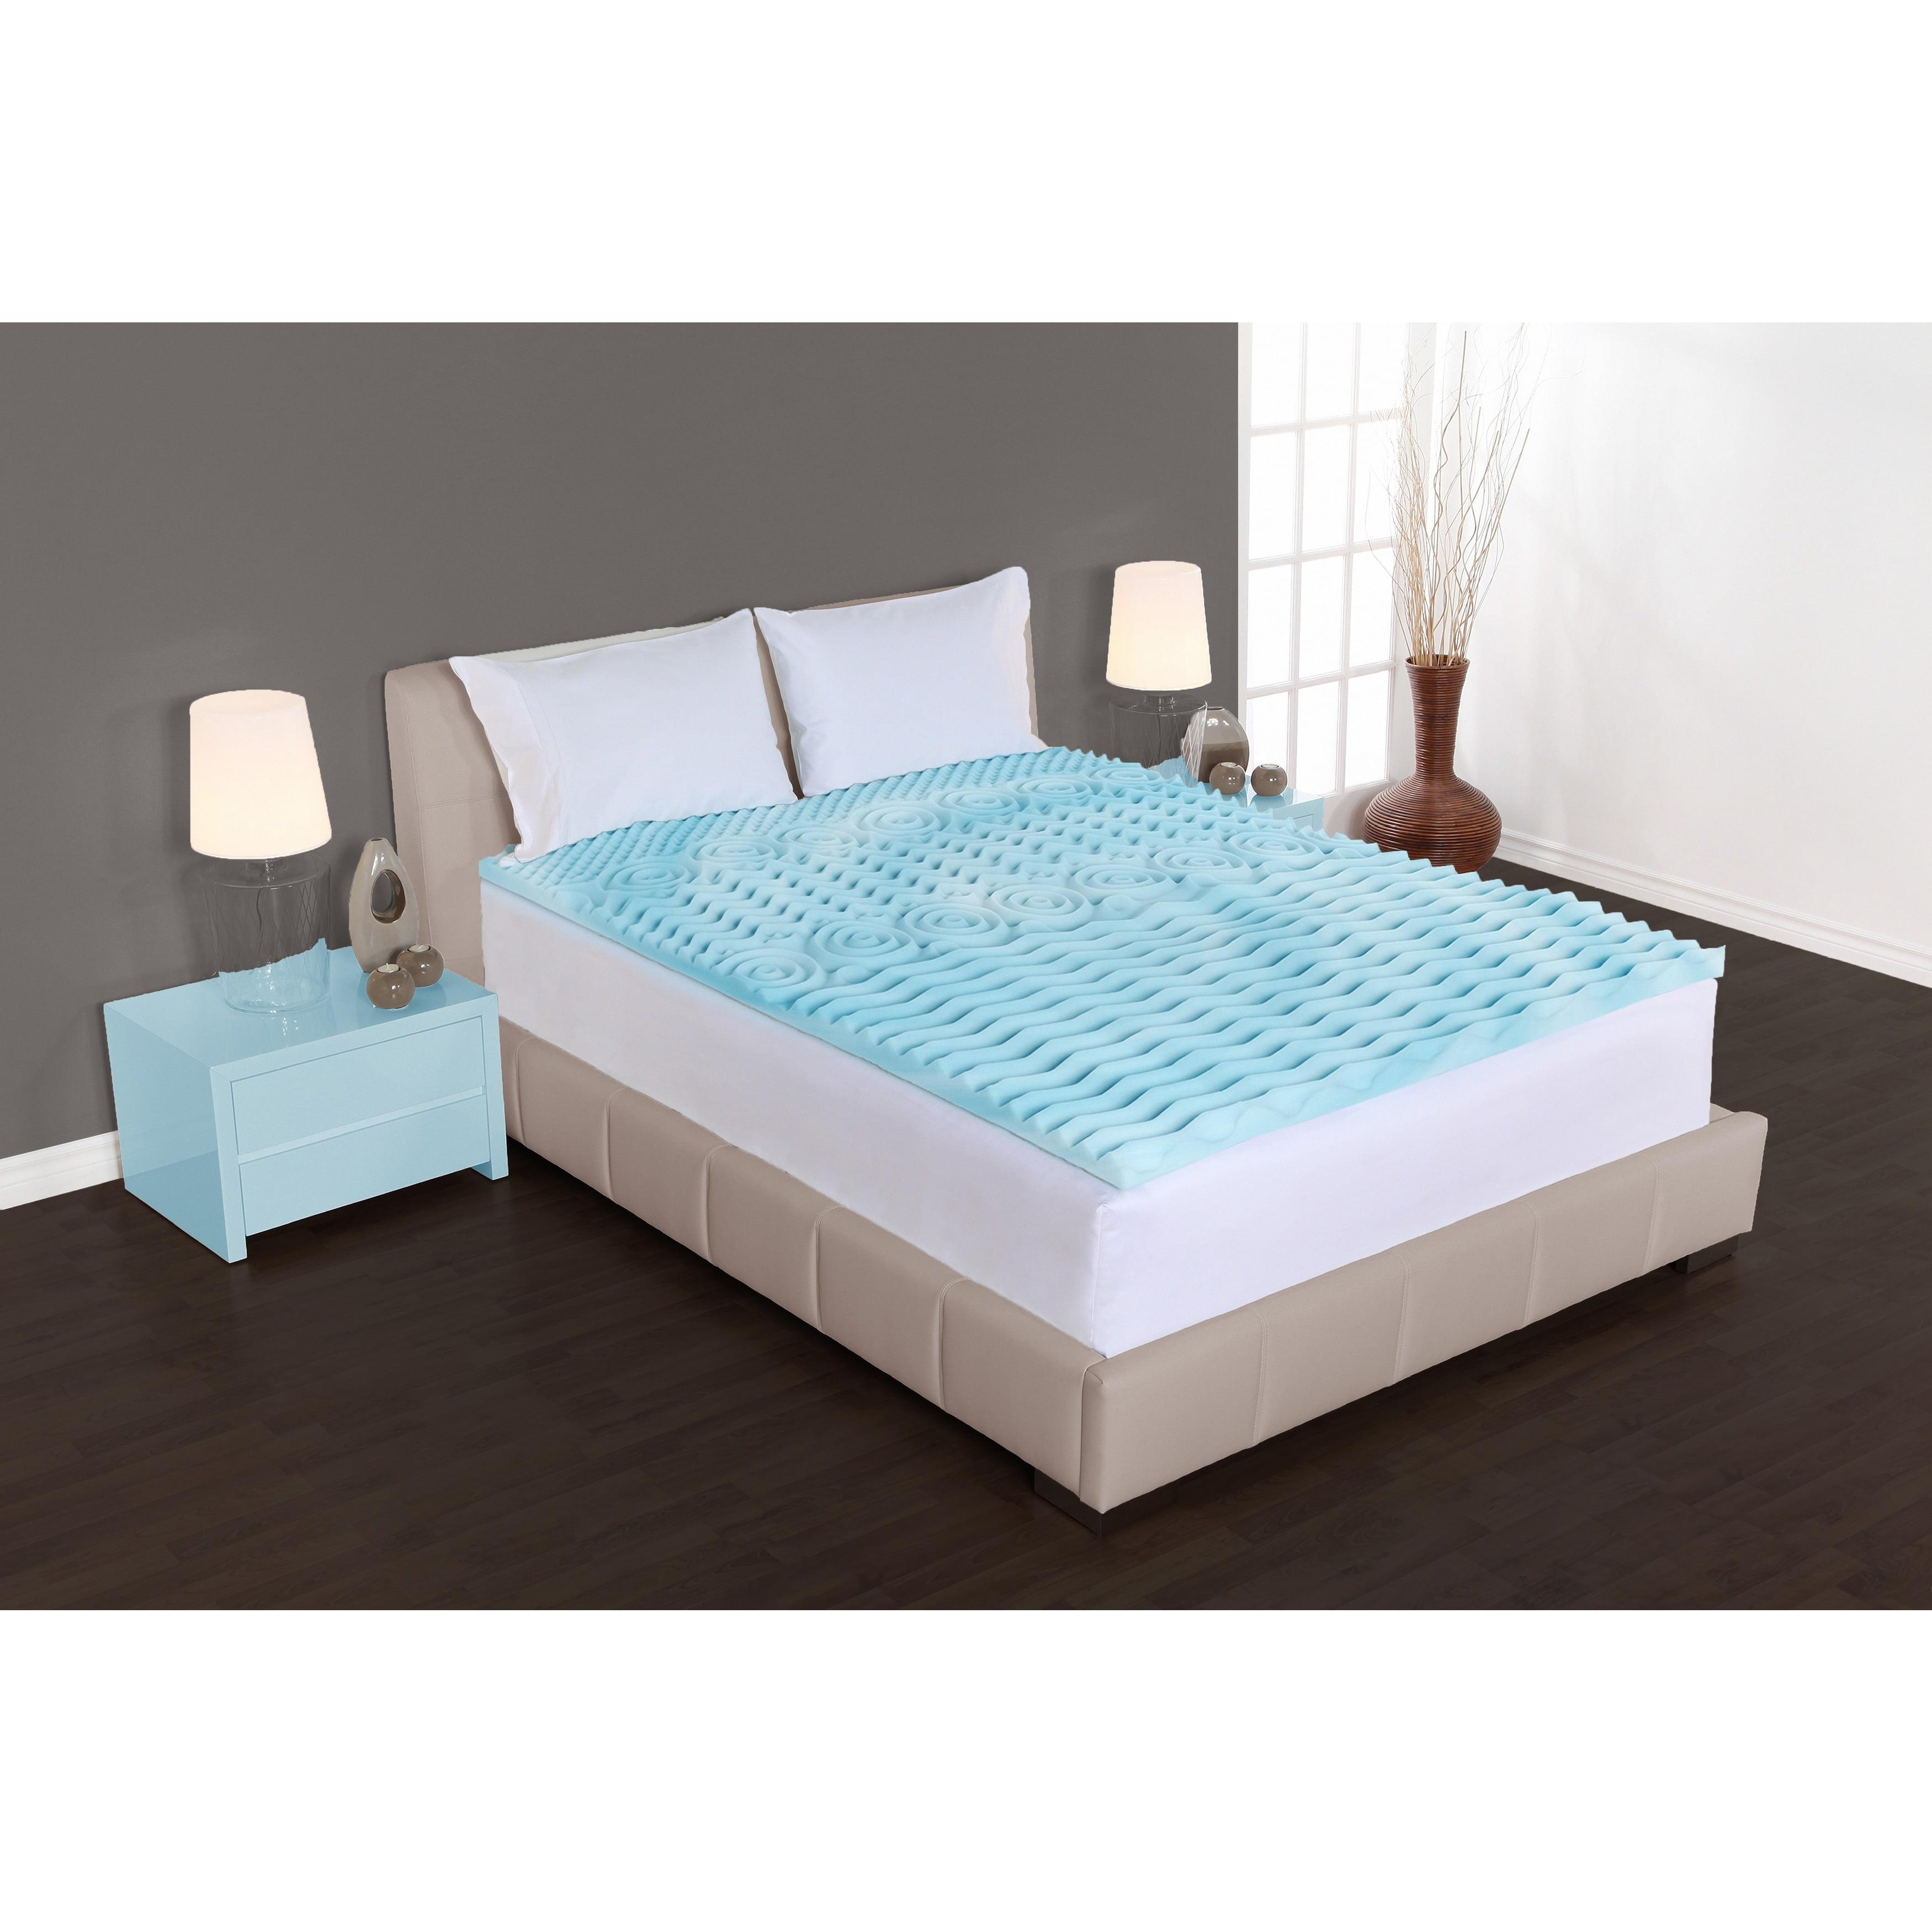 authentic comfort 2inch comfort rx 5zone foam mattress topper walmart com